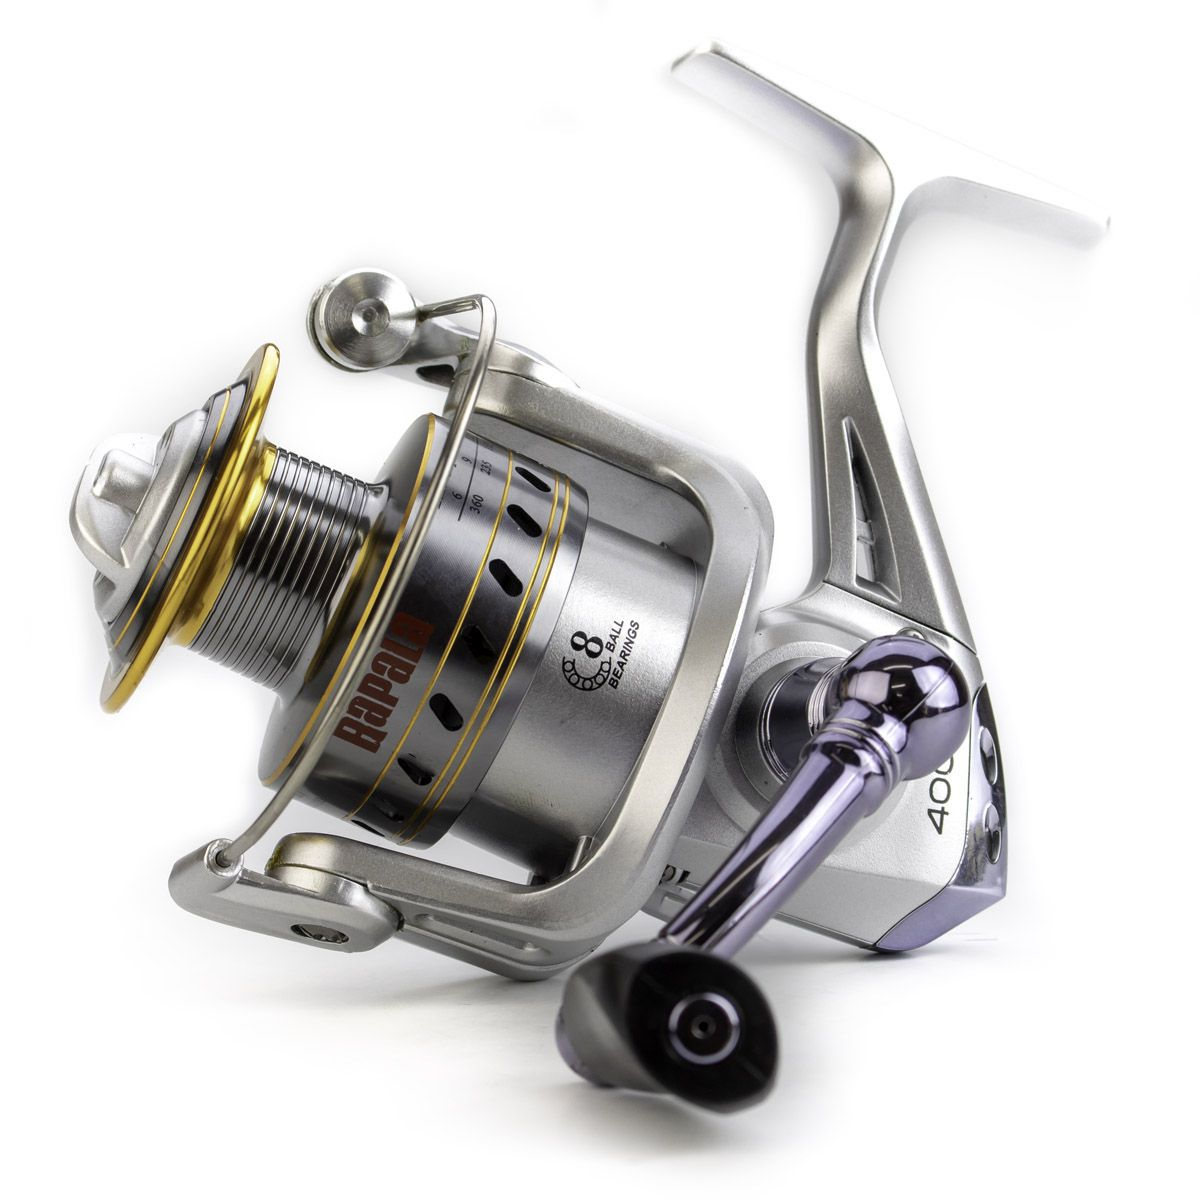 Molinete Rapala Corux 3000  - Comprando & Pescando